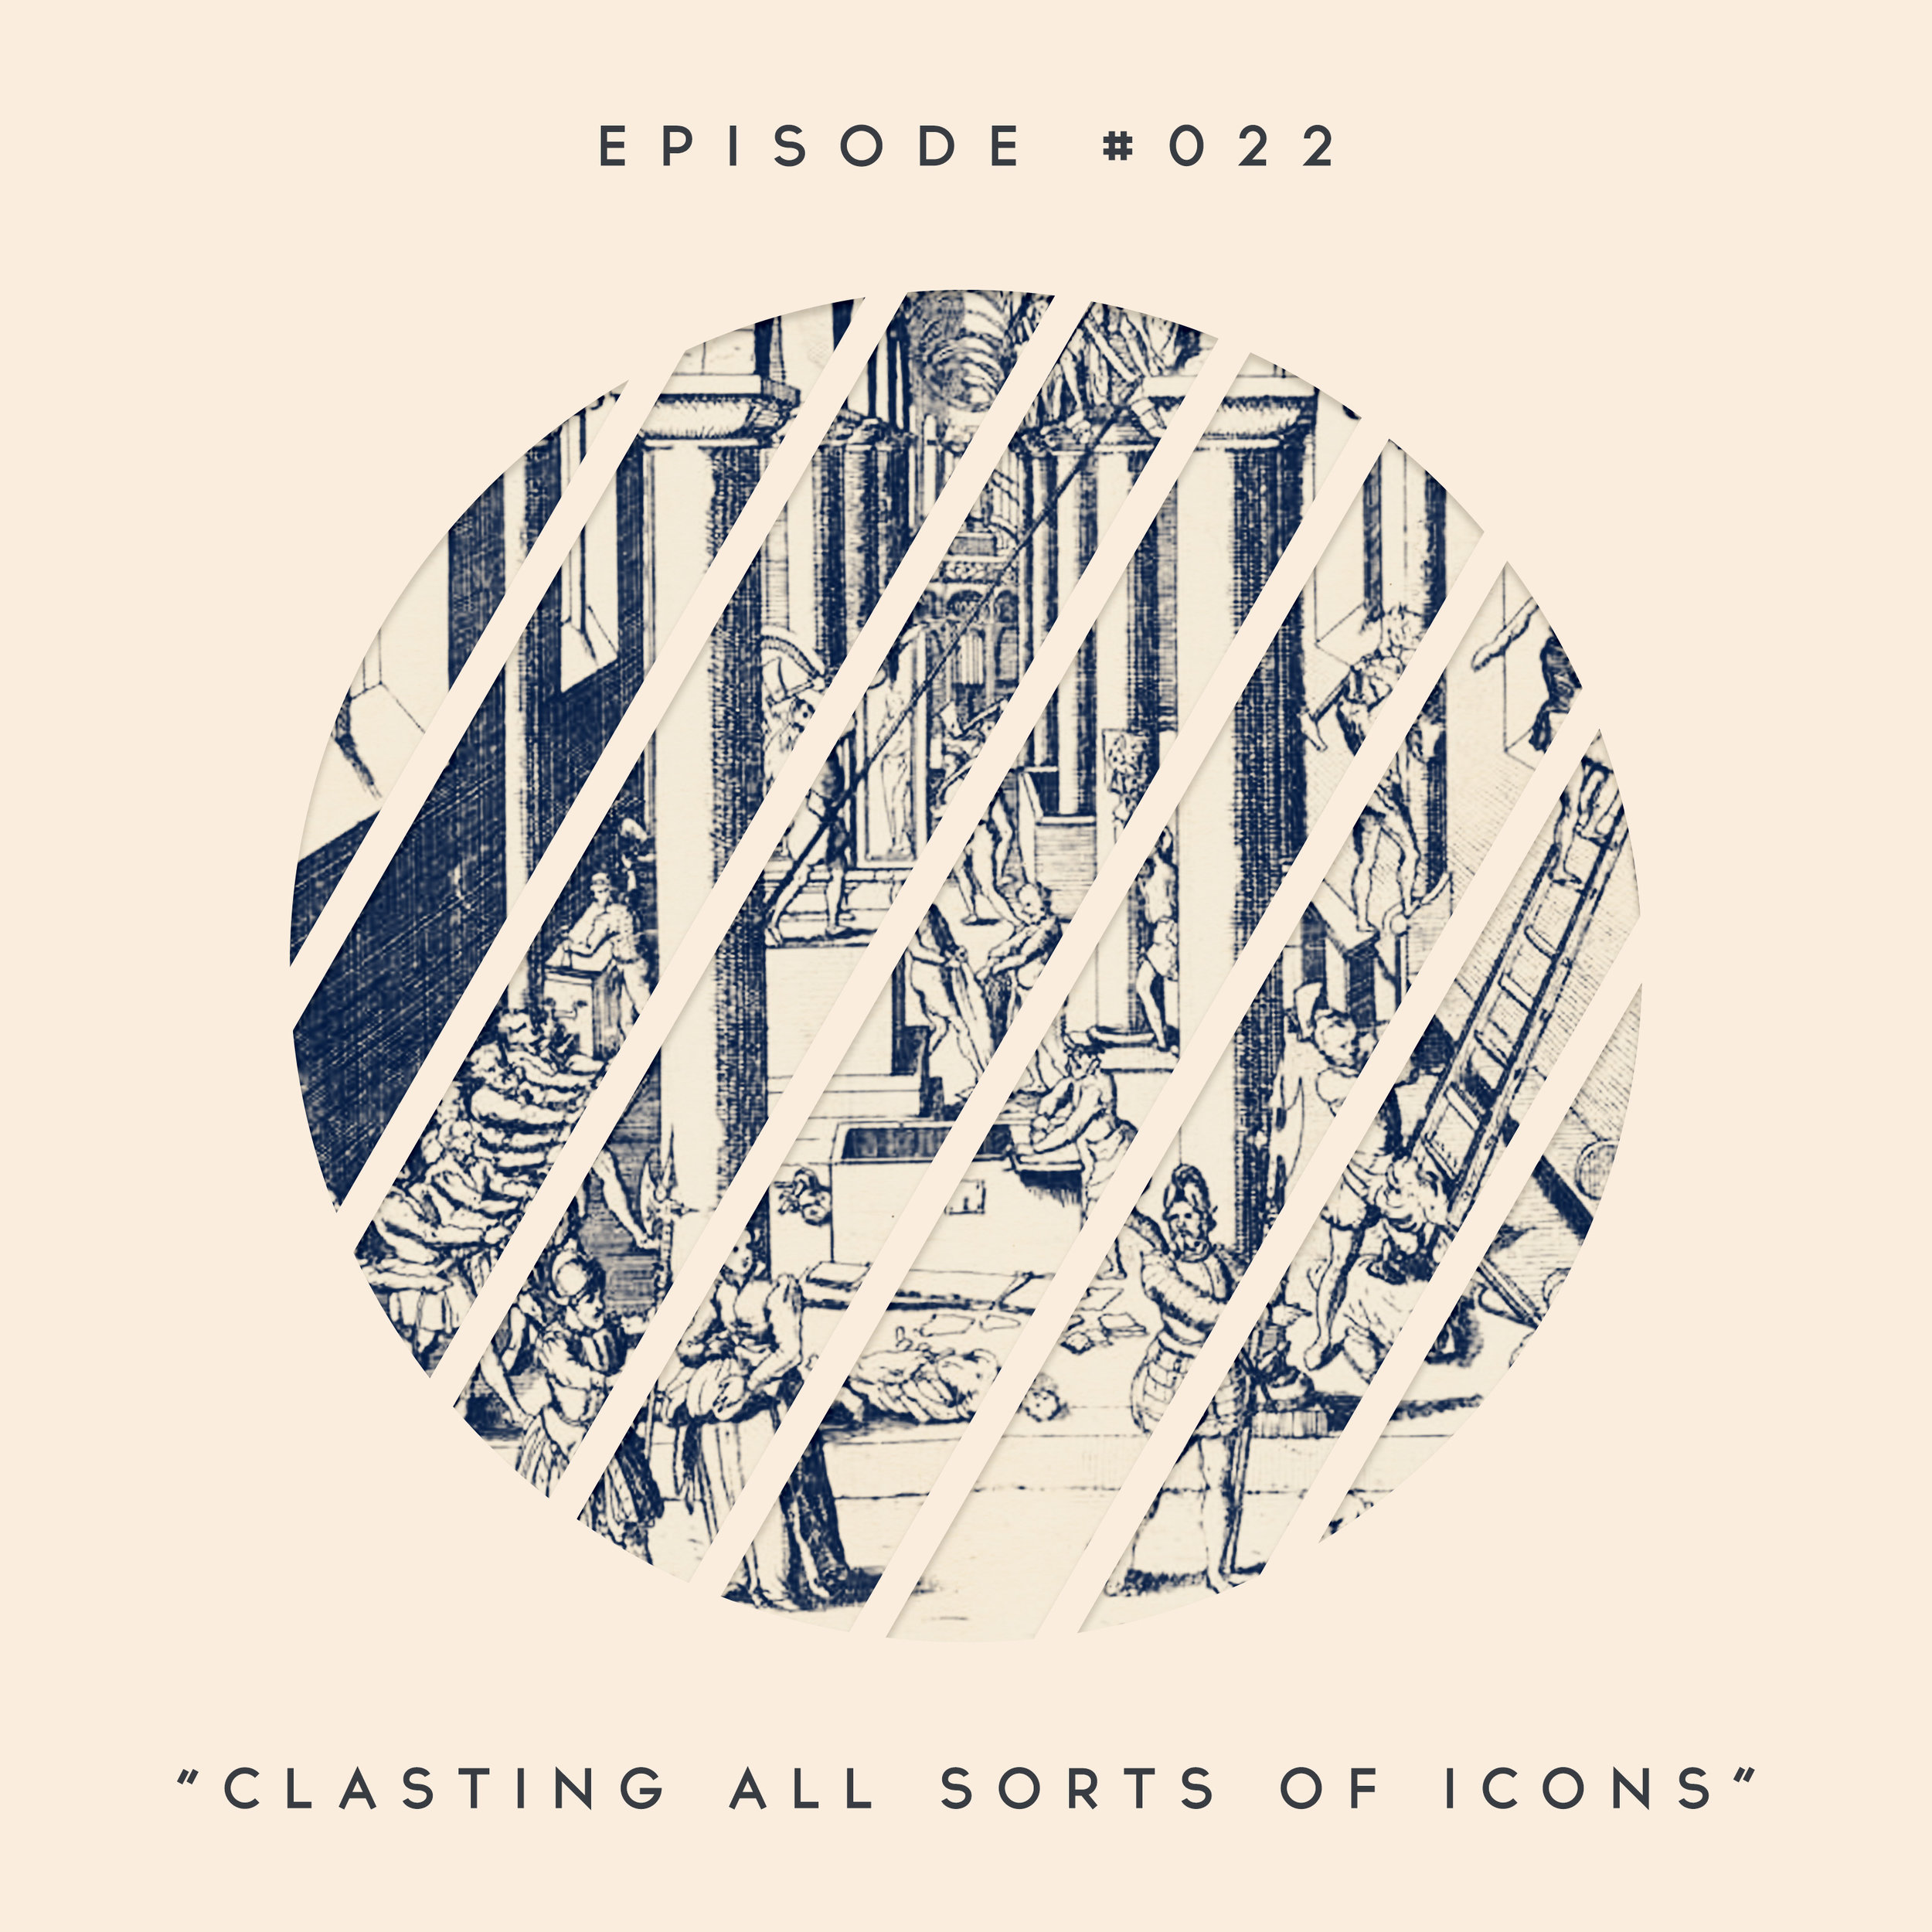 Clasting-Icons.jpg